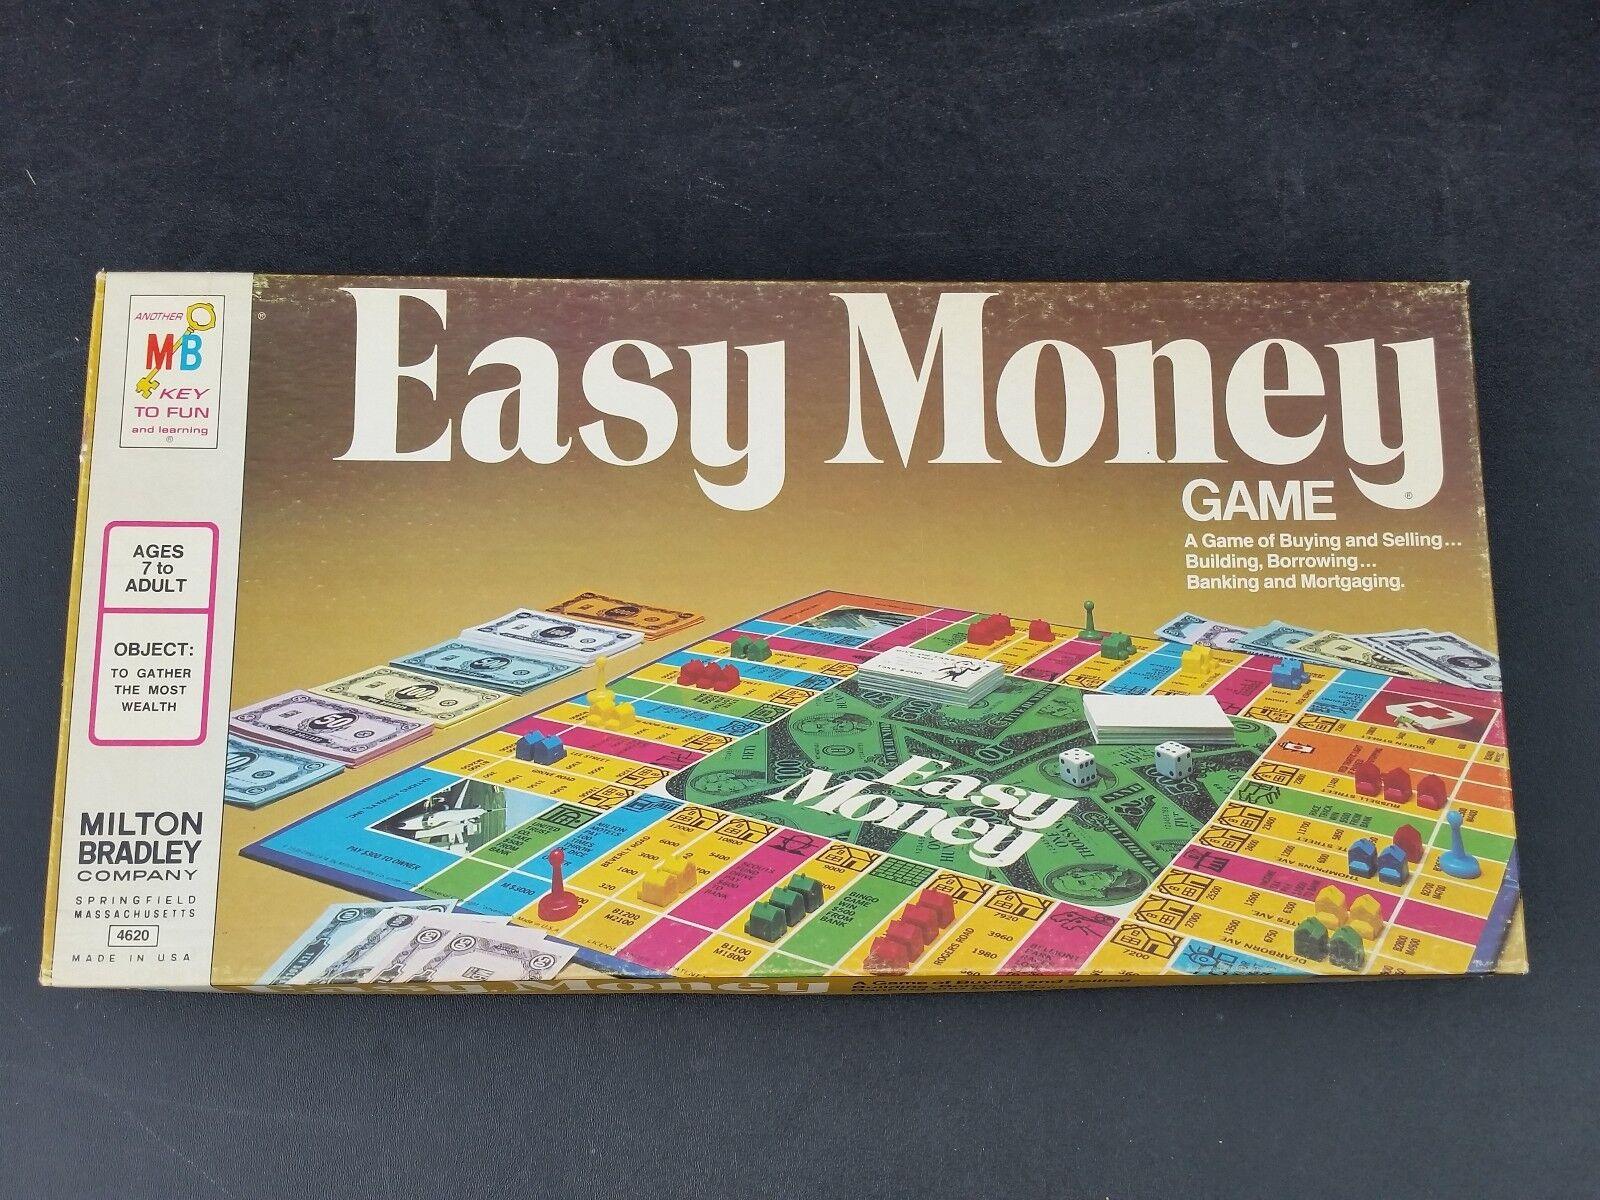 rescontentglobalinflowinflowcomponenttechnicalissues Vintage Milton Bradley Easy Money Game